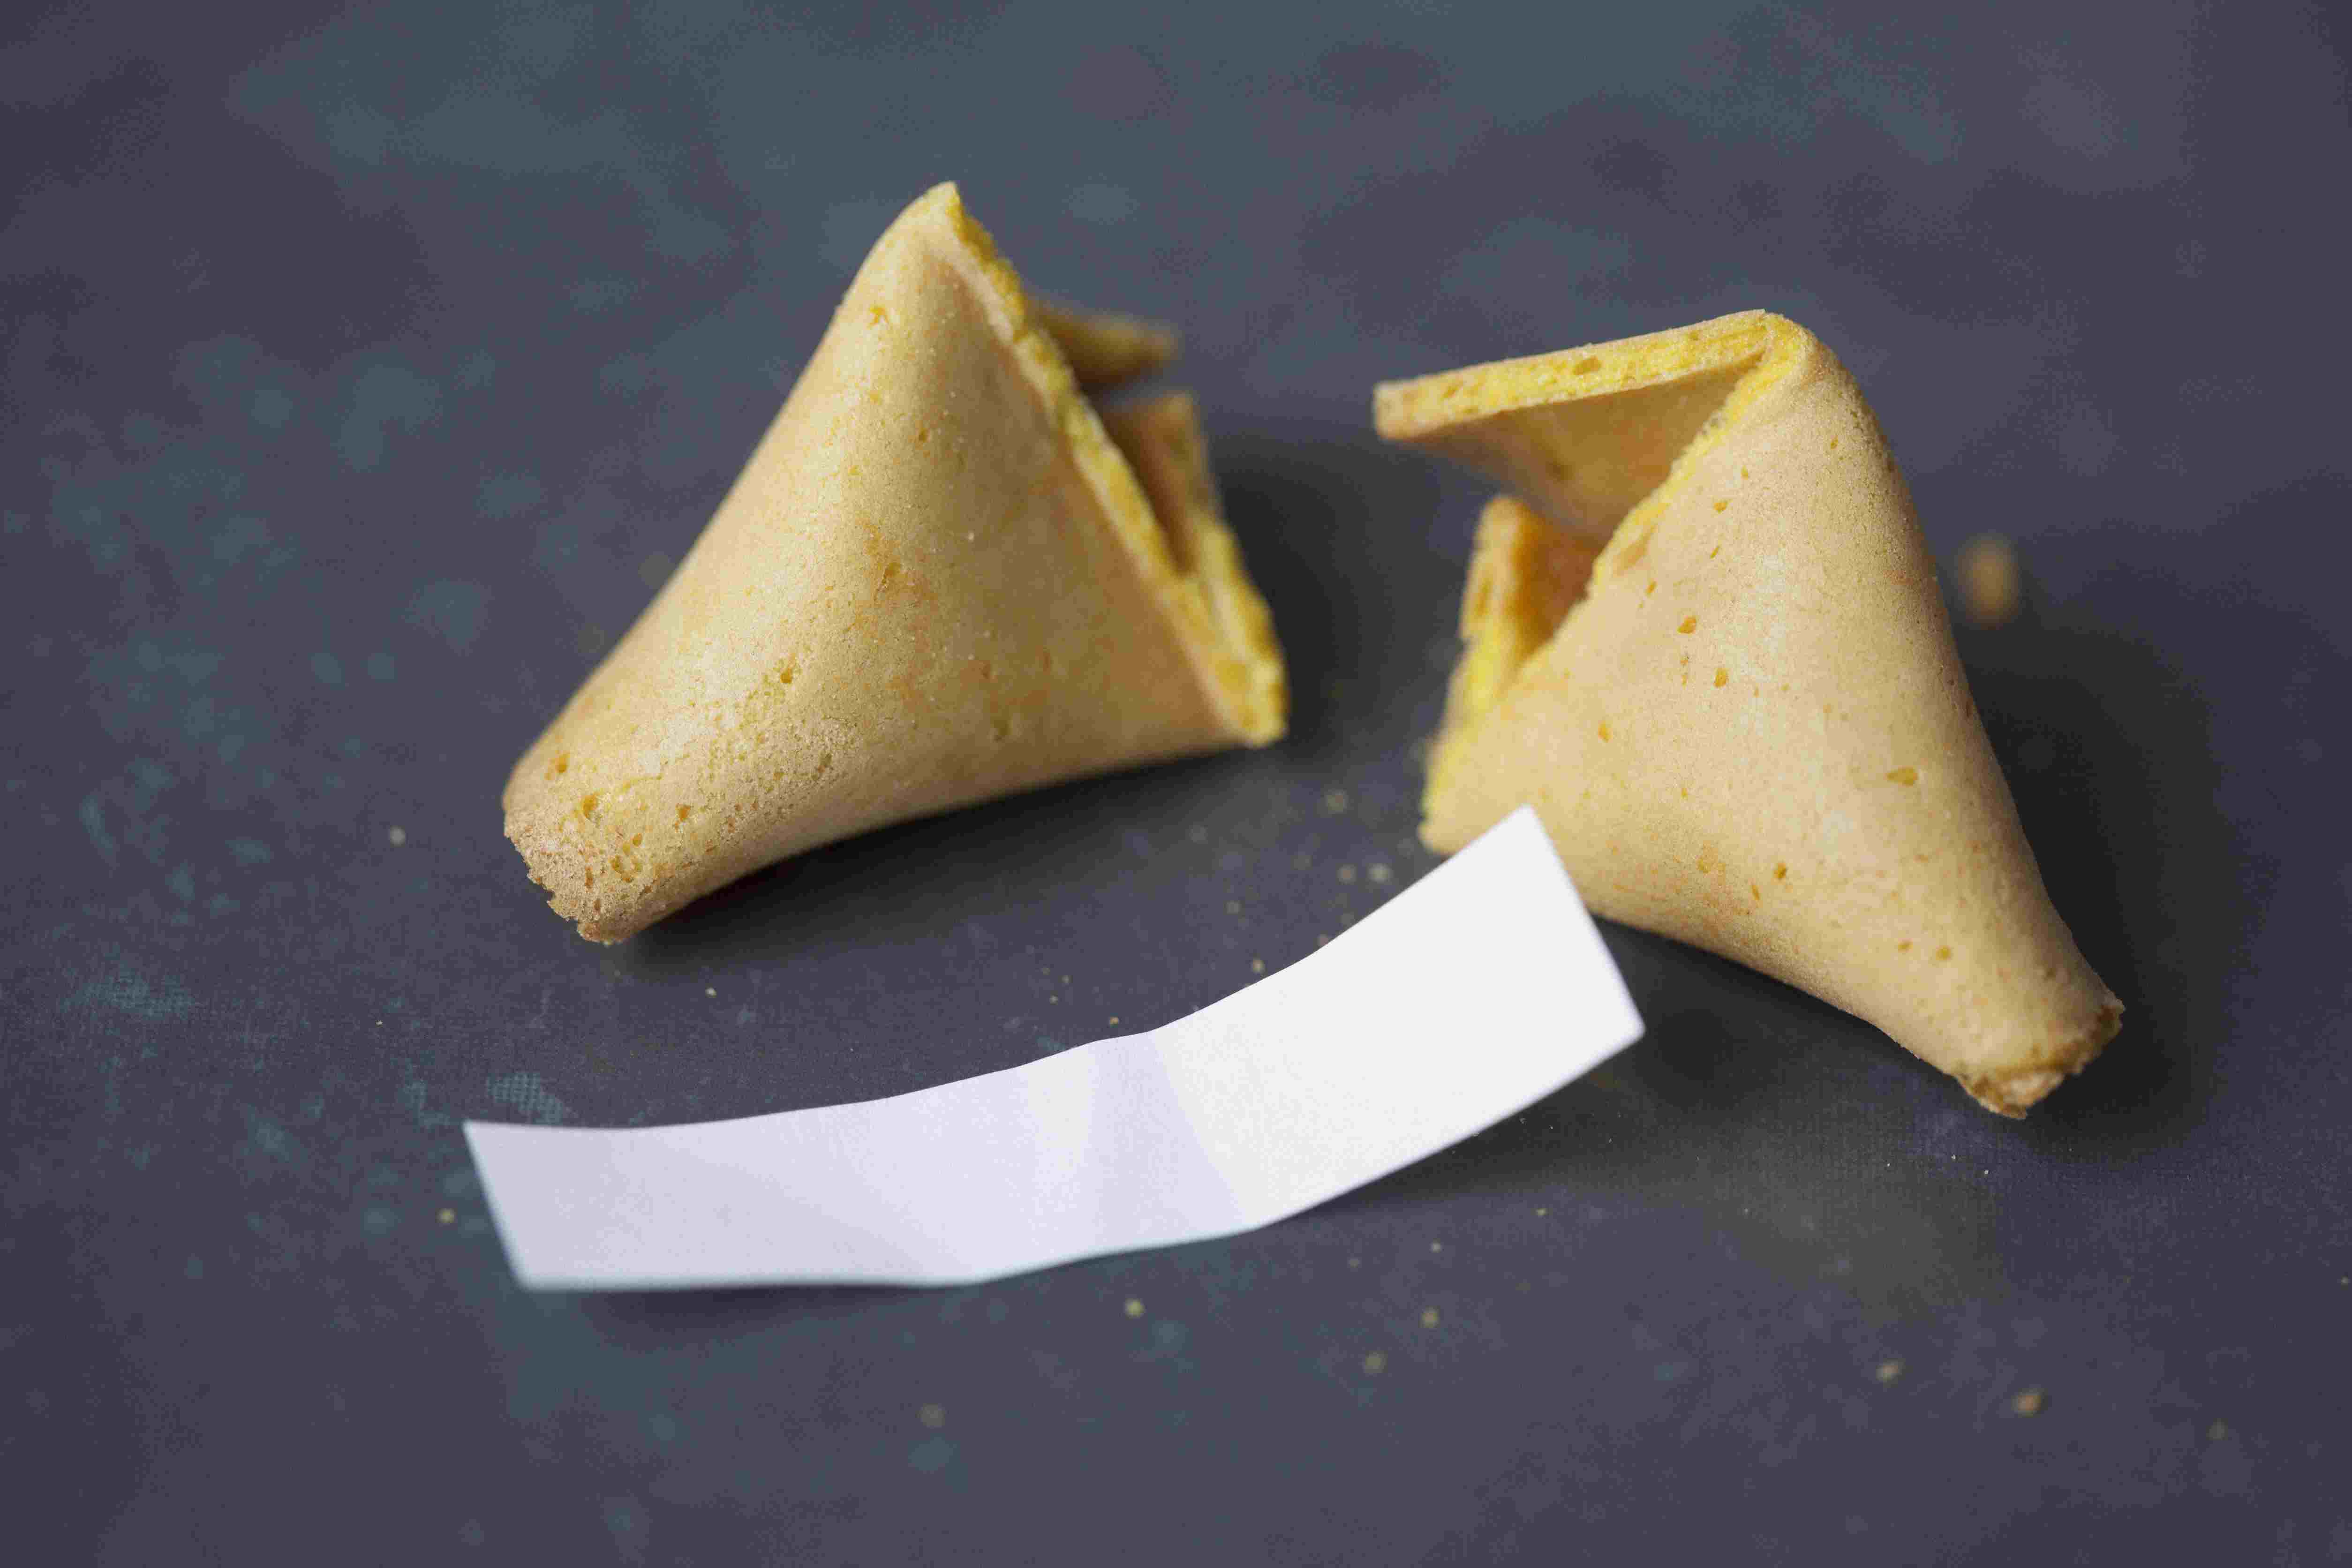 Broken fortune cookie on table